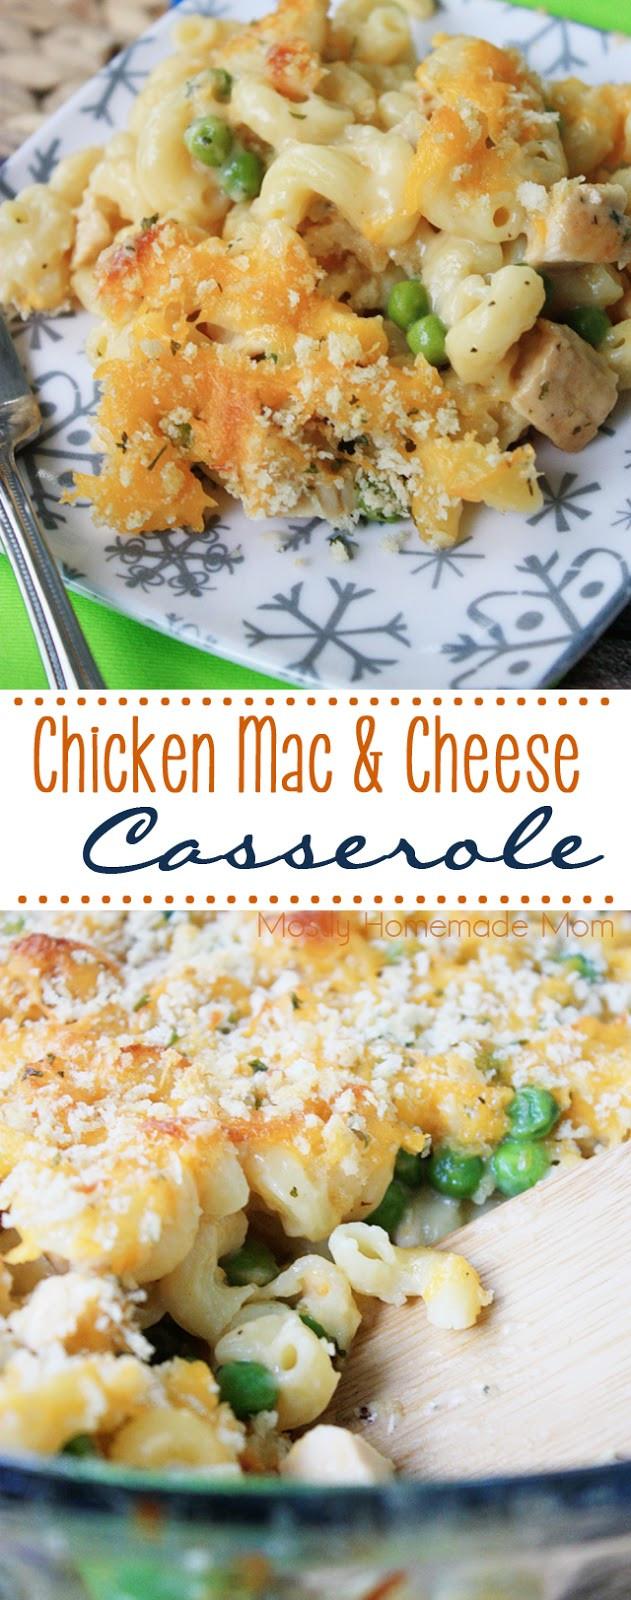 Chicken Mac And Cheese Casserole  Chicken Mac & Cheese Casserole